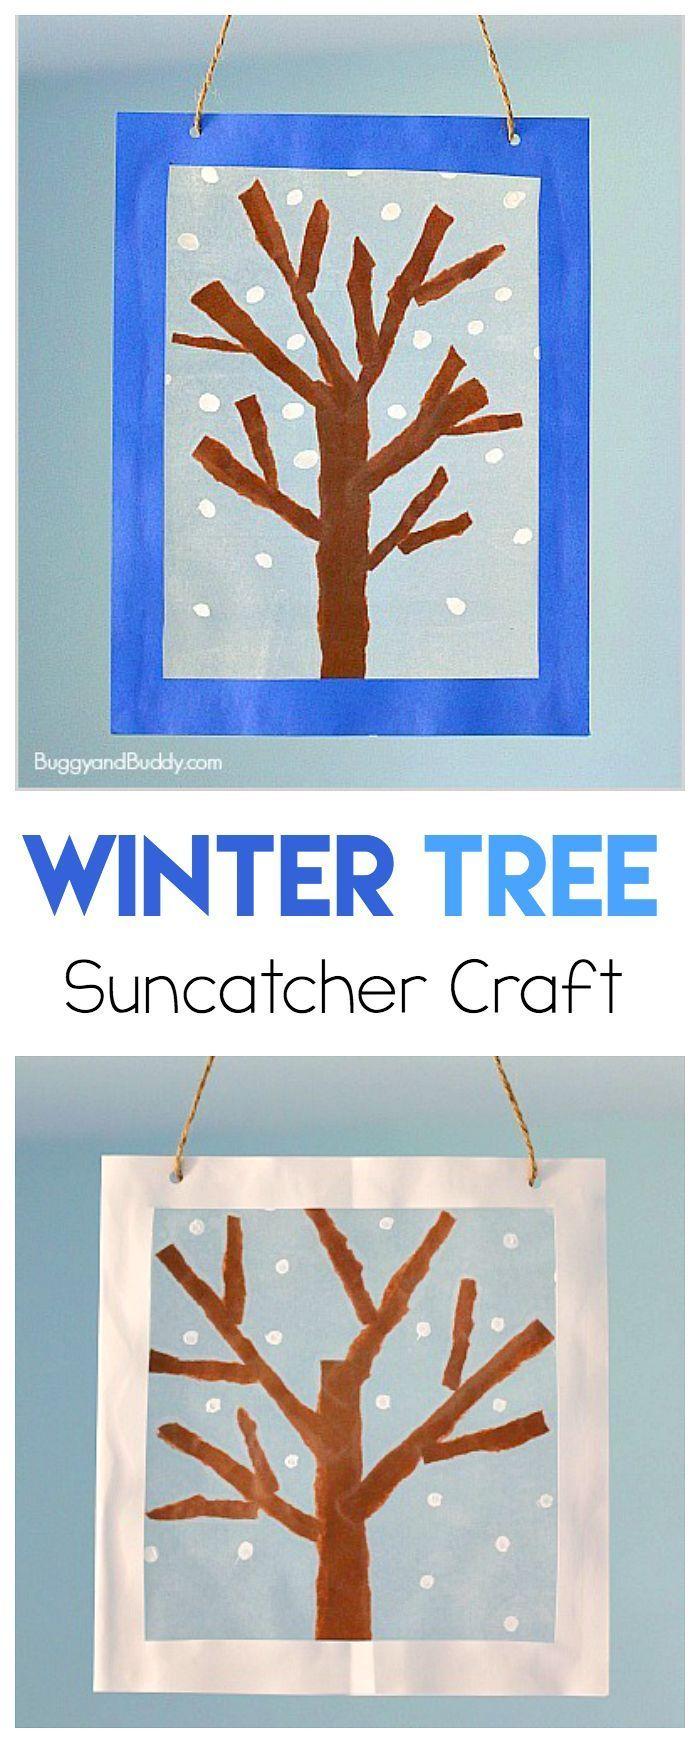 Easy Winter Craft For Kids Tear Art Tree Suncatcher BuggyandBuddy